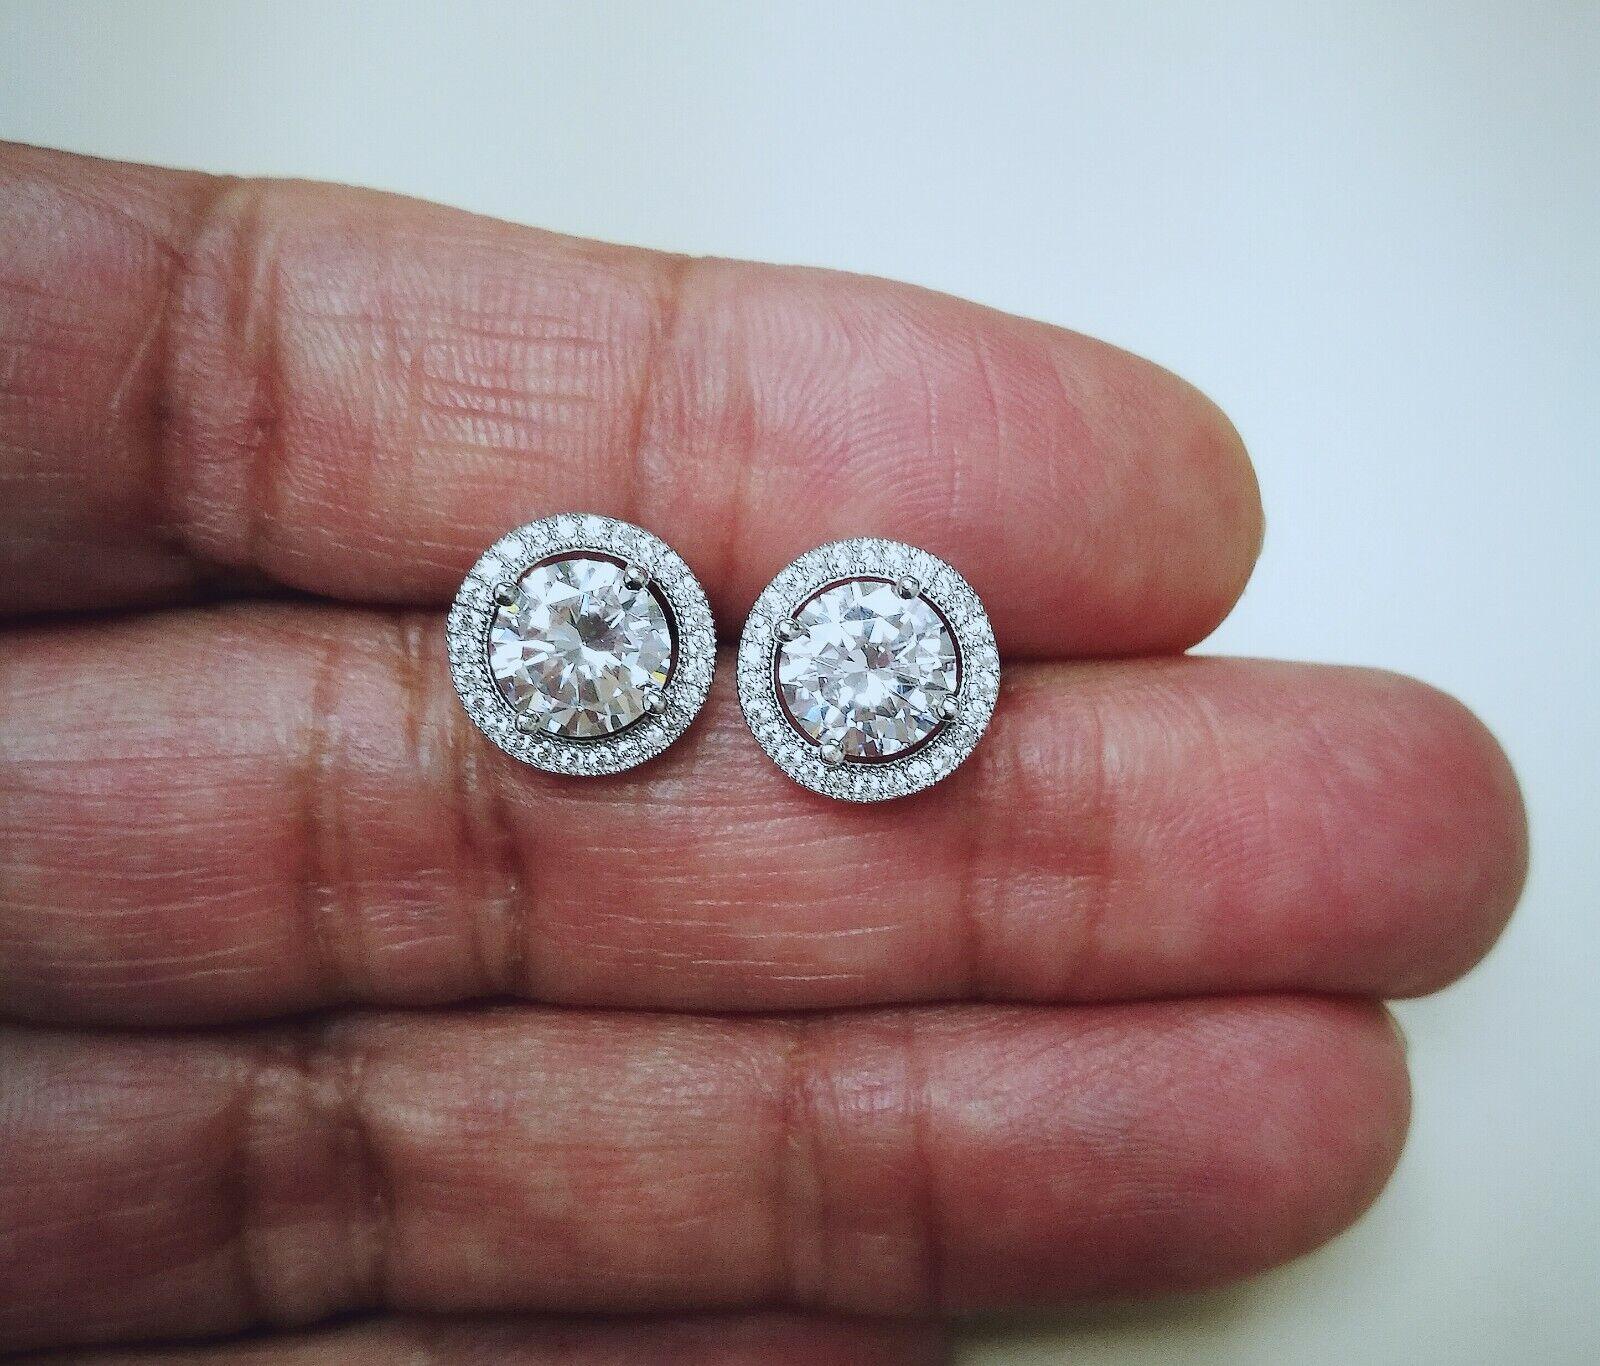 3 Ct Round Diamond Stud Earrings 14k White Gold over Womens Halo Earrings